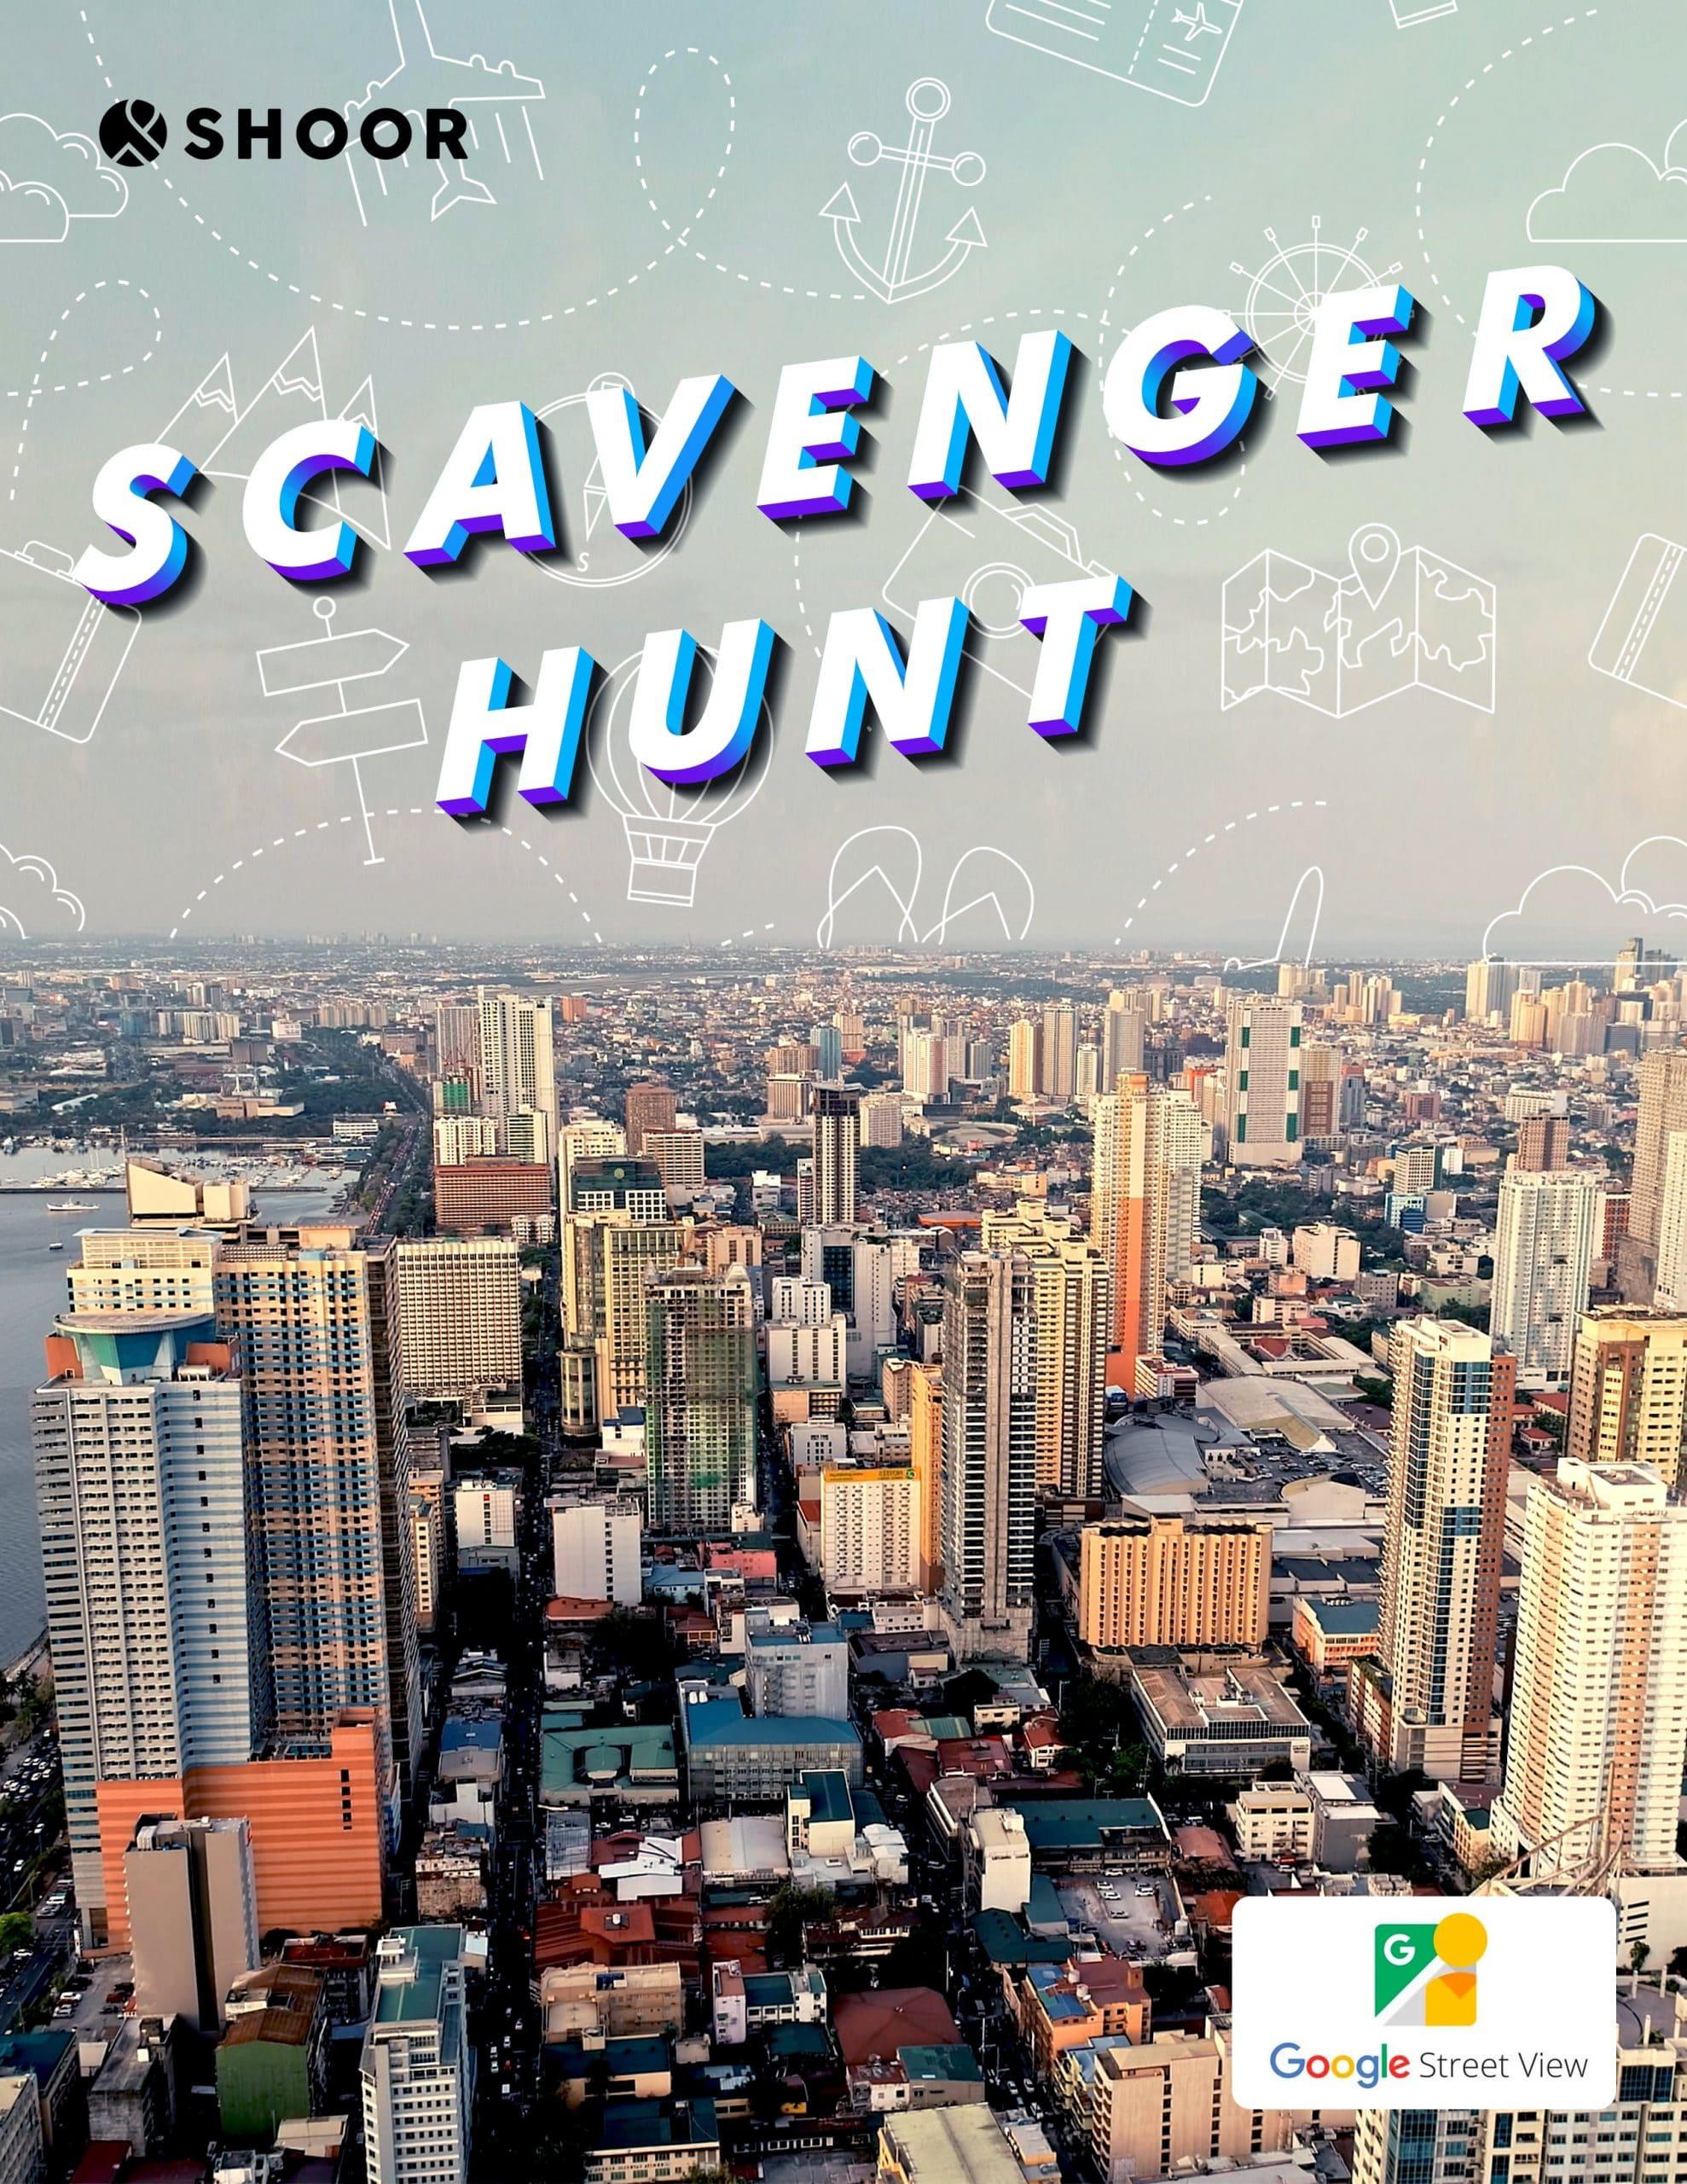 Scavenger Hunt: virtual team building activity